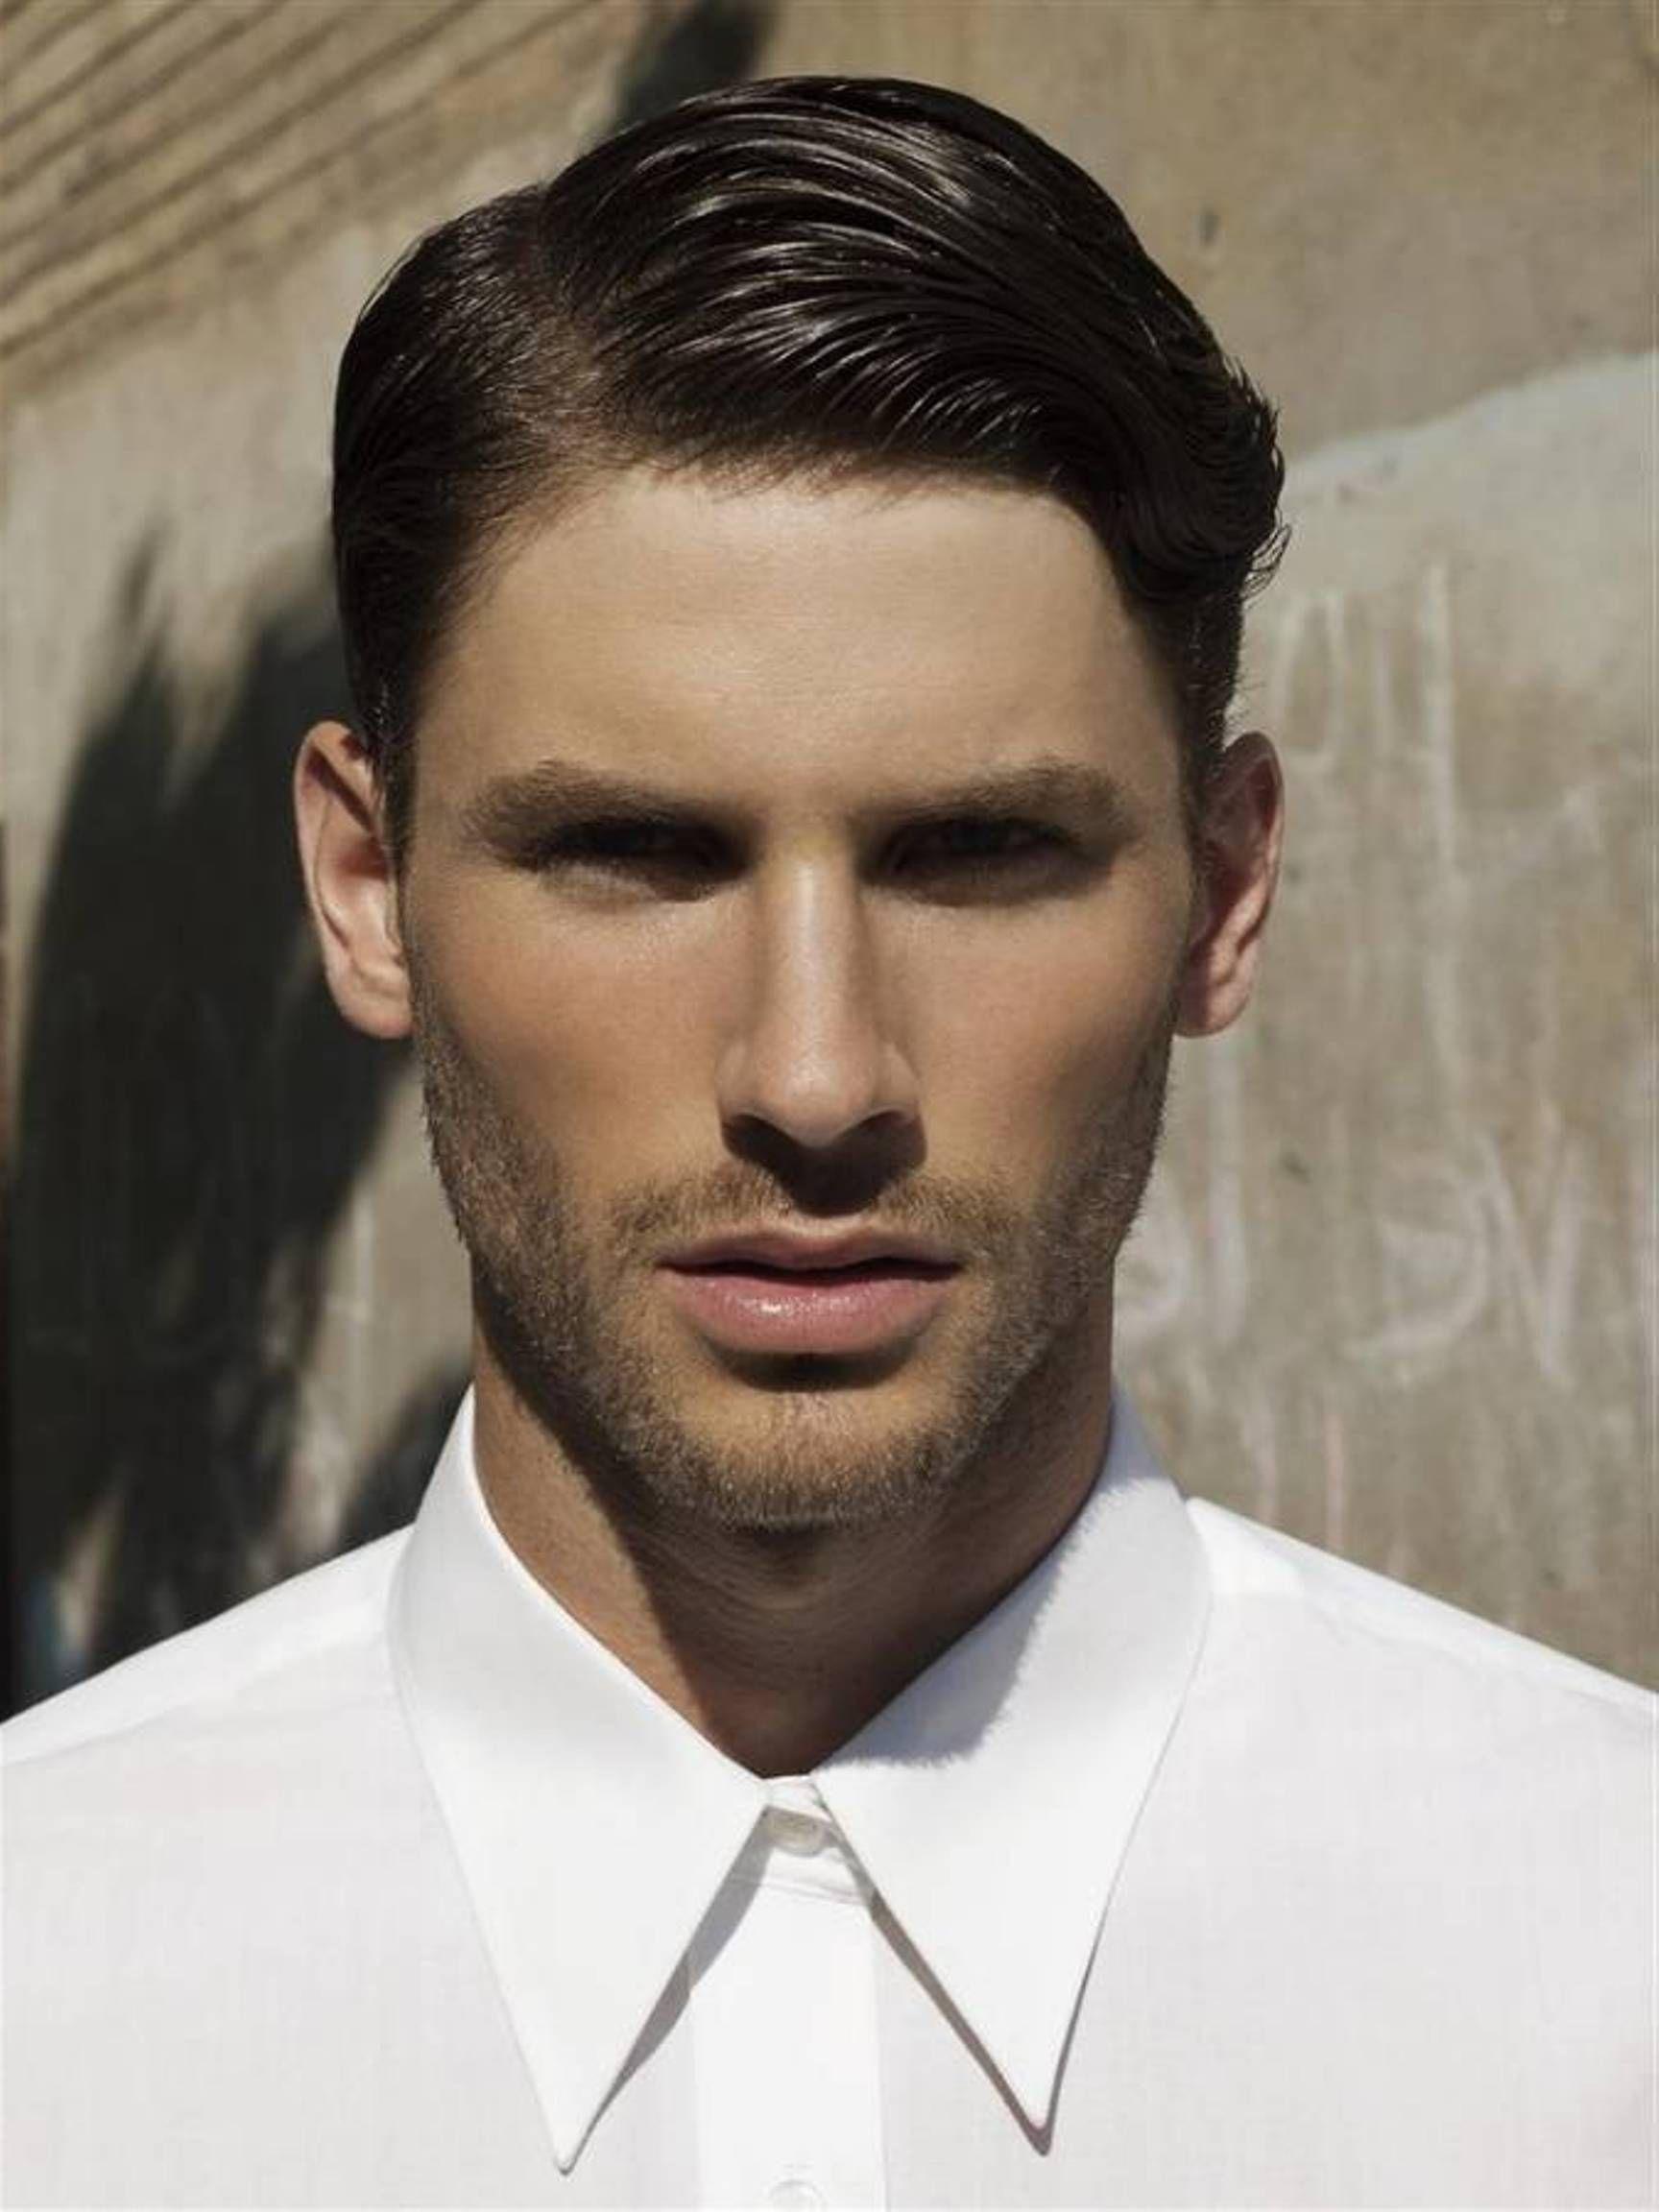 formal short hairstyle for wedding | men hairstyles | pinterest